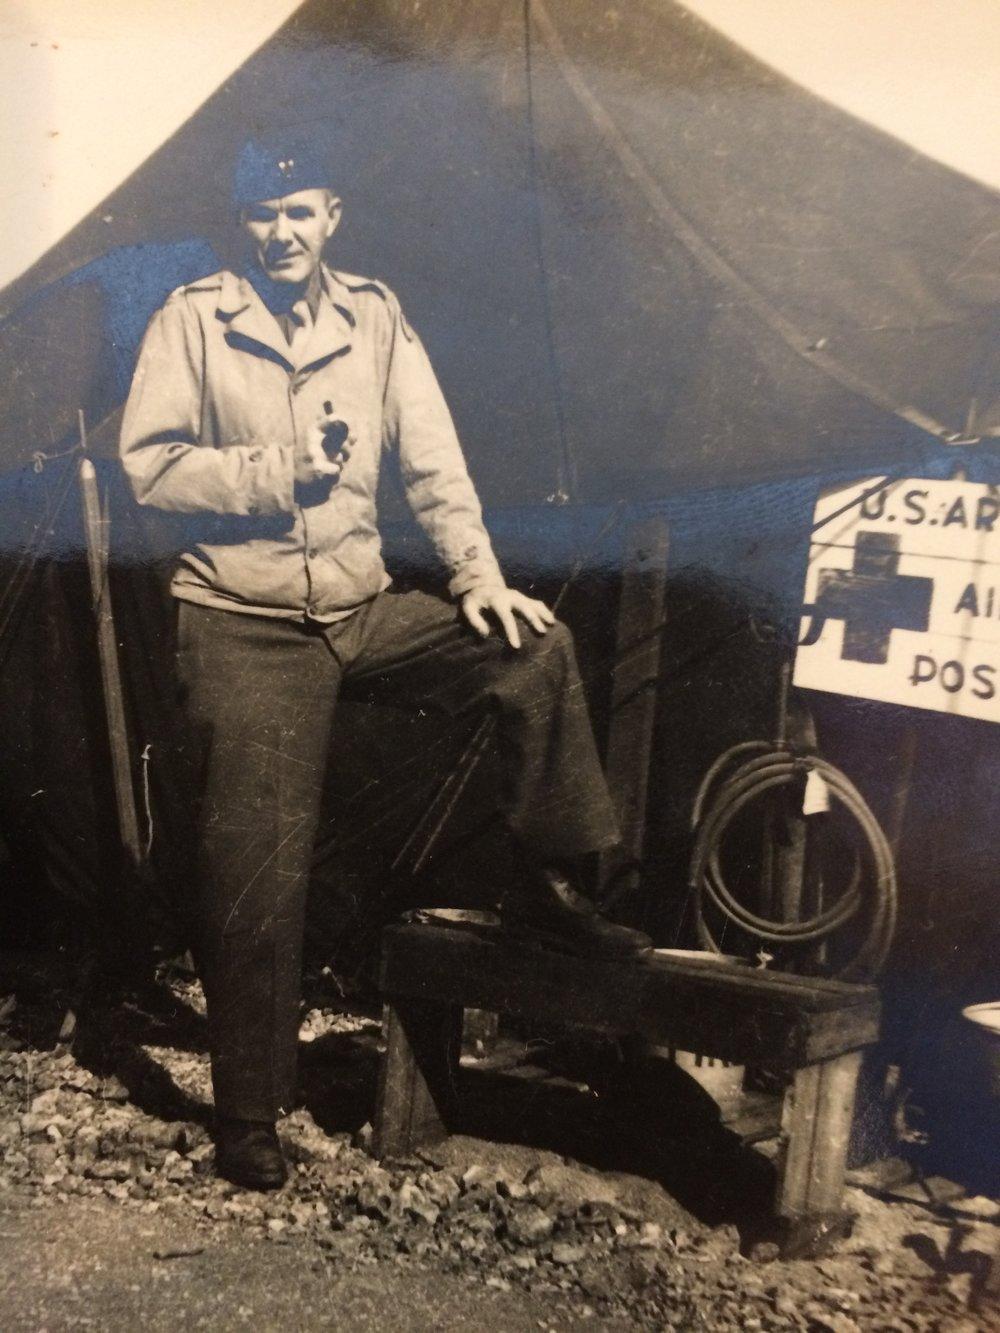 Bob's dad, Dr. Melvin Rackleff